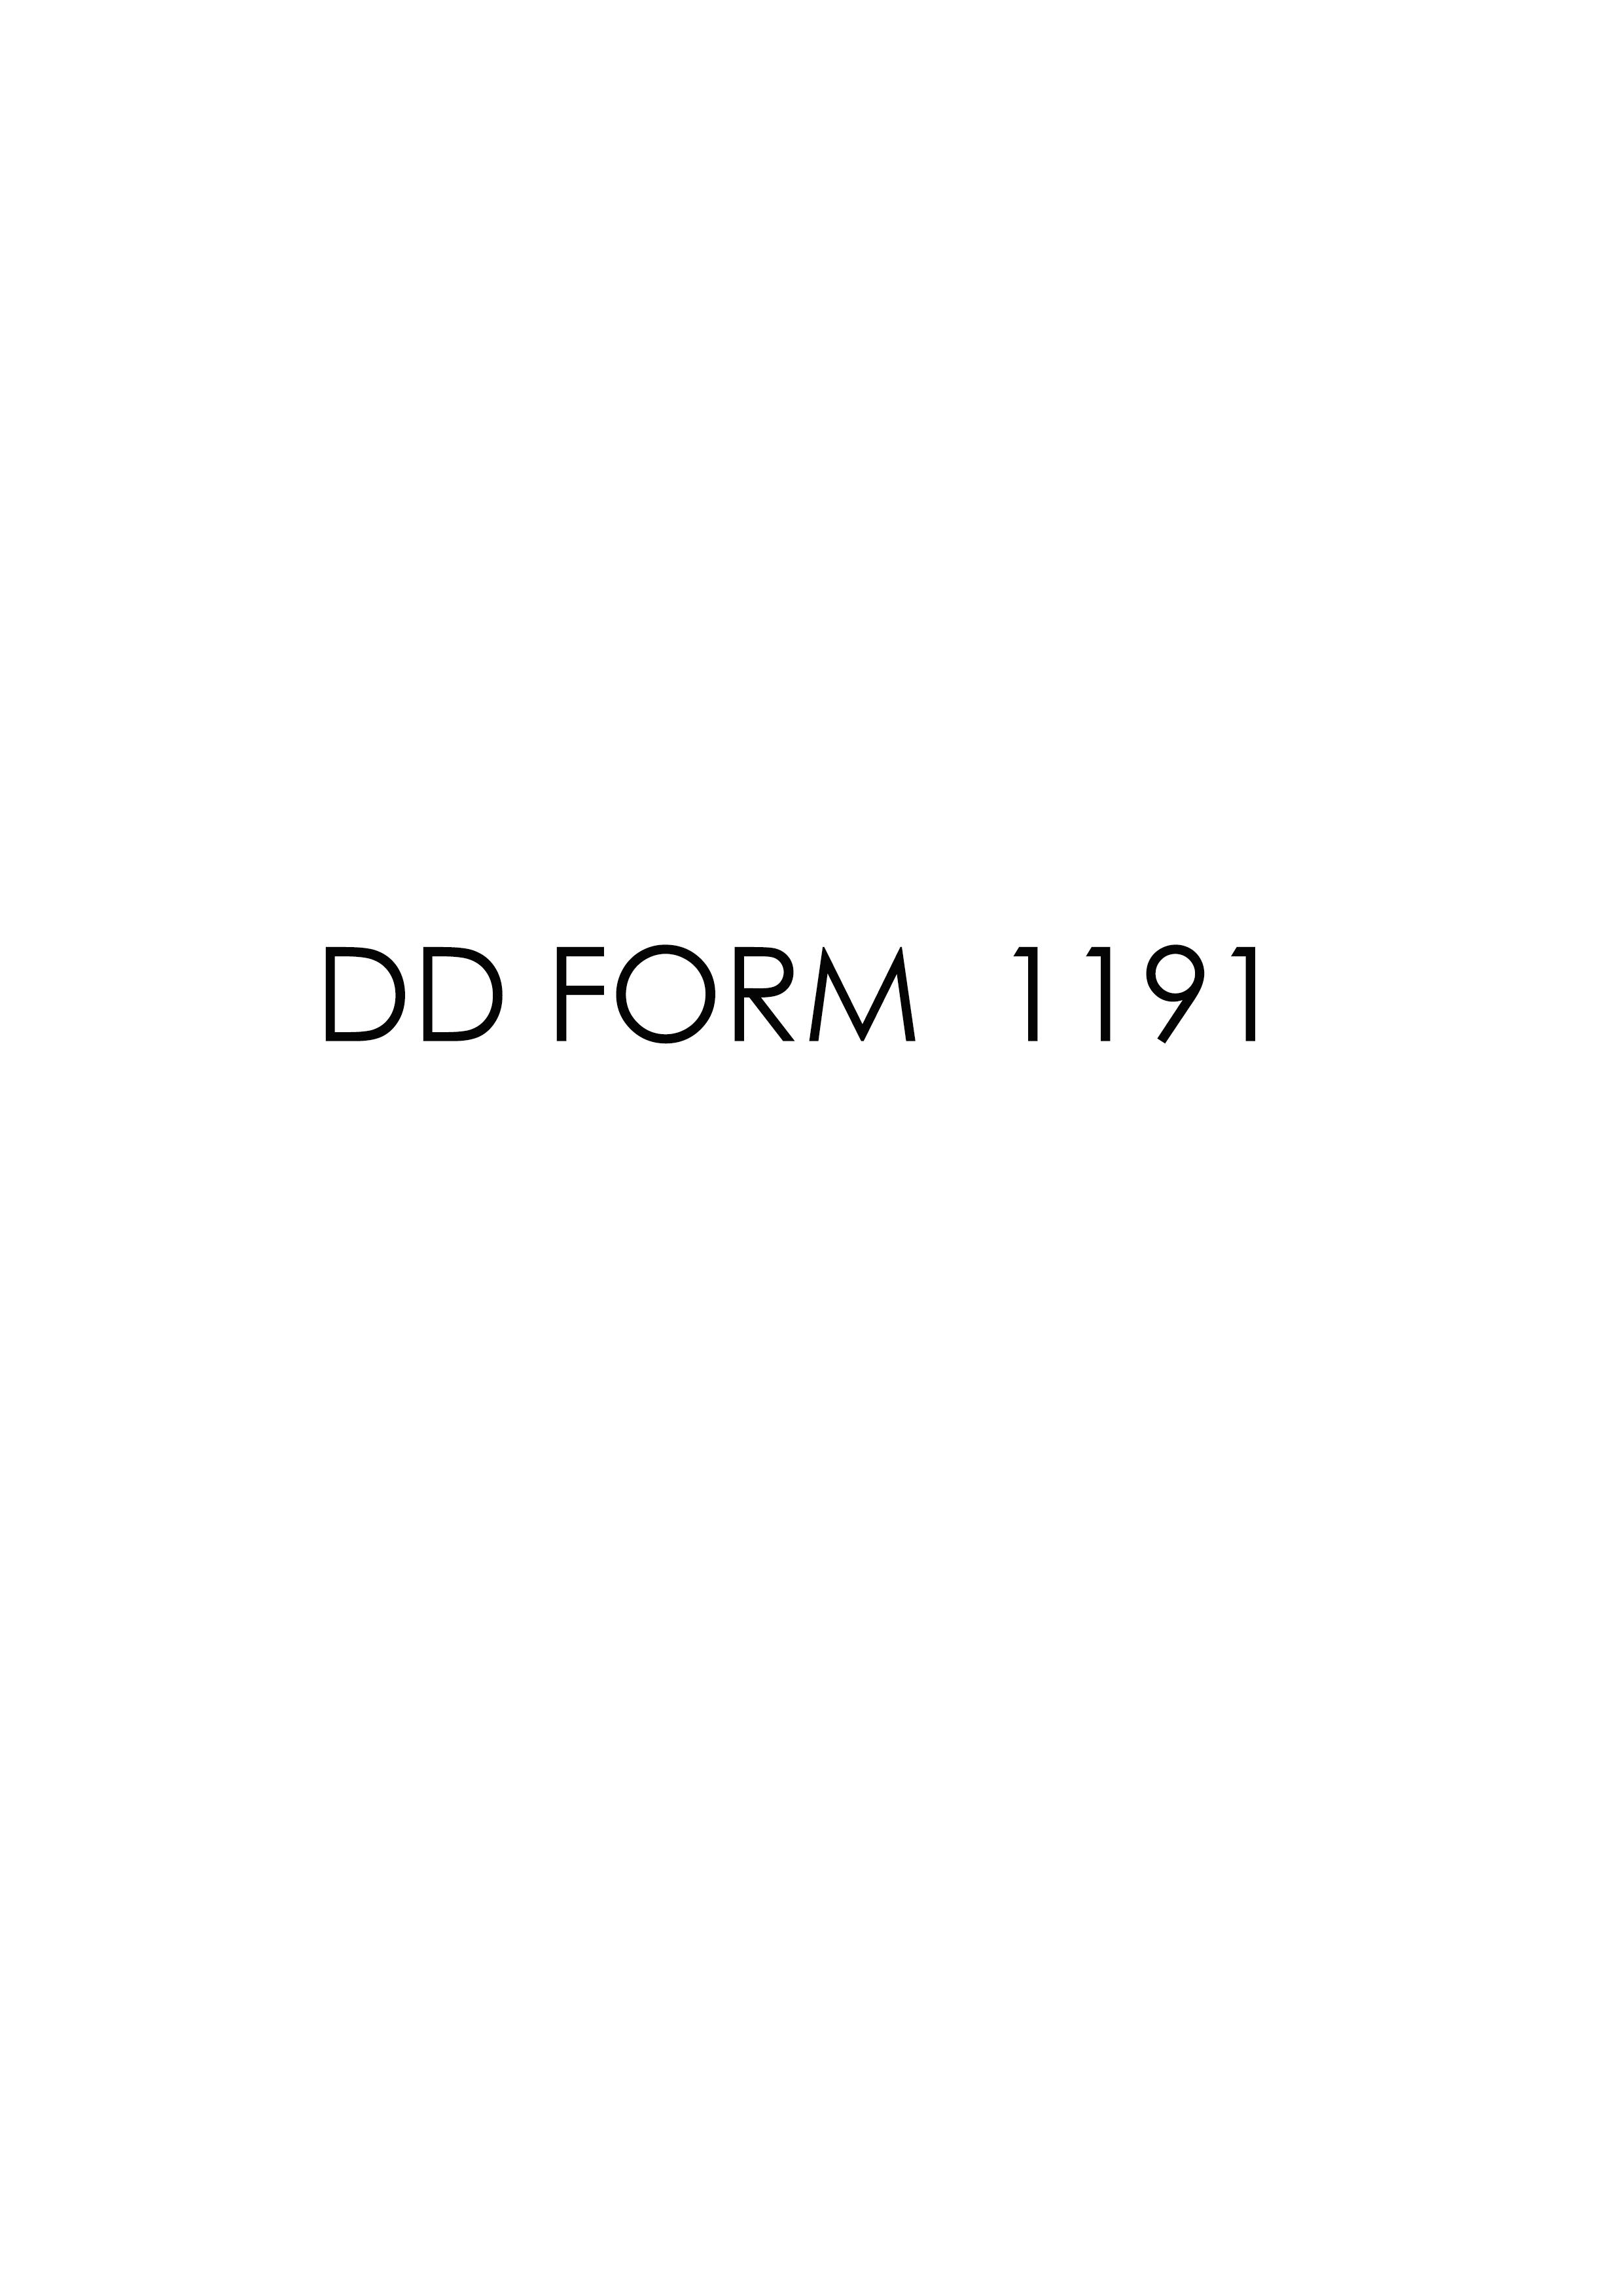 Download dd Form 1191 Free